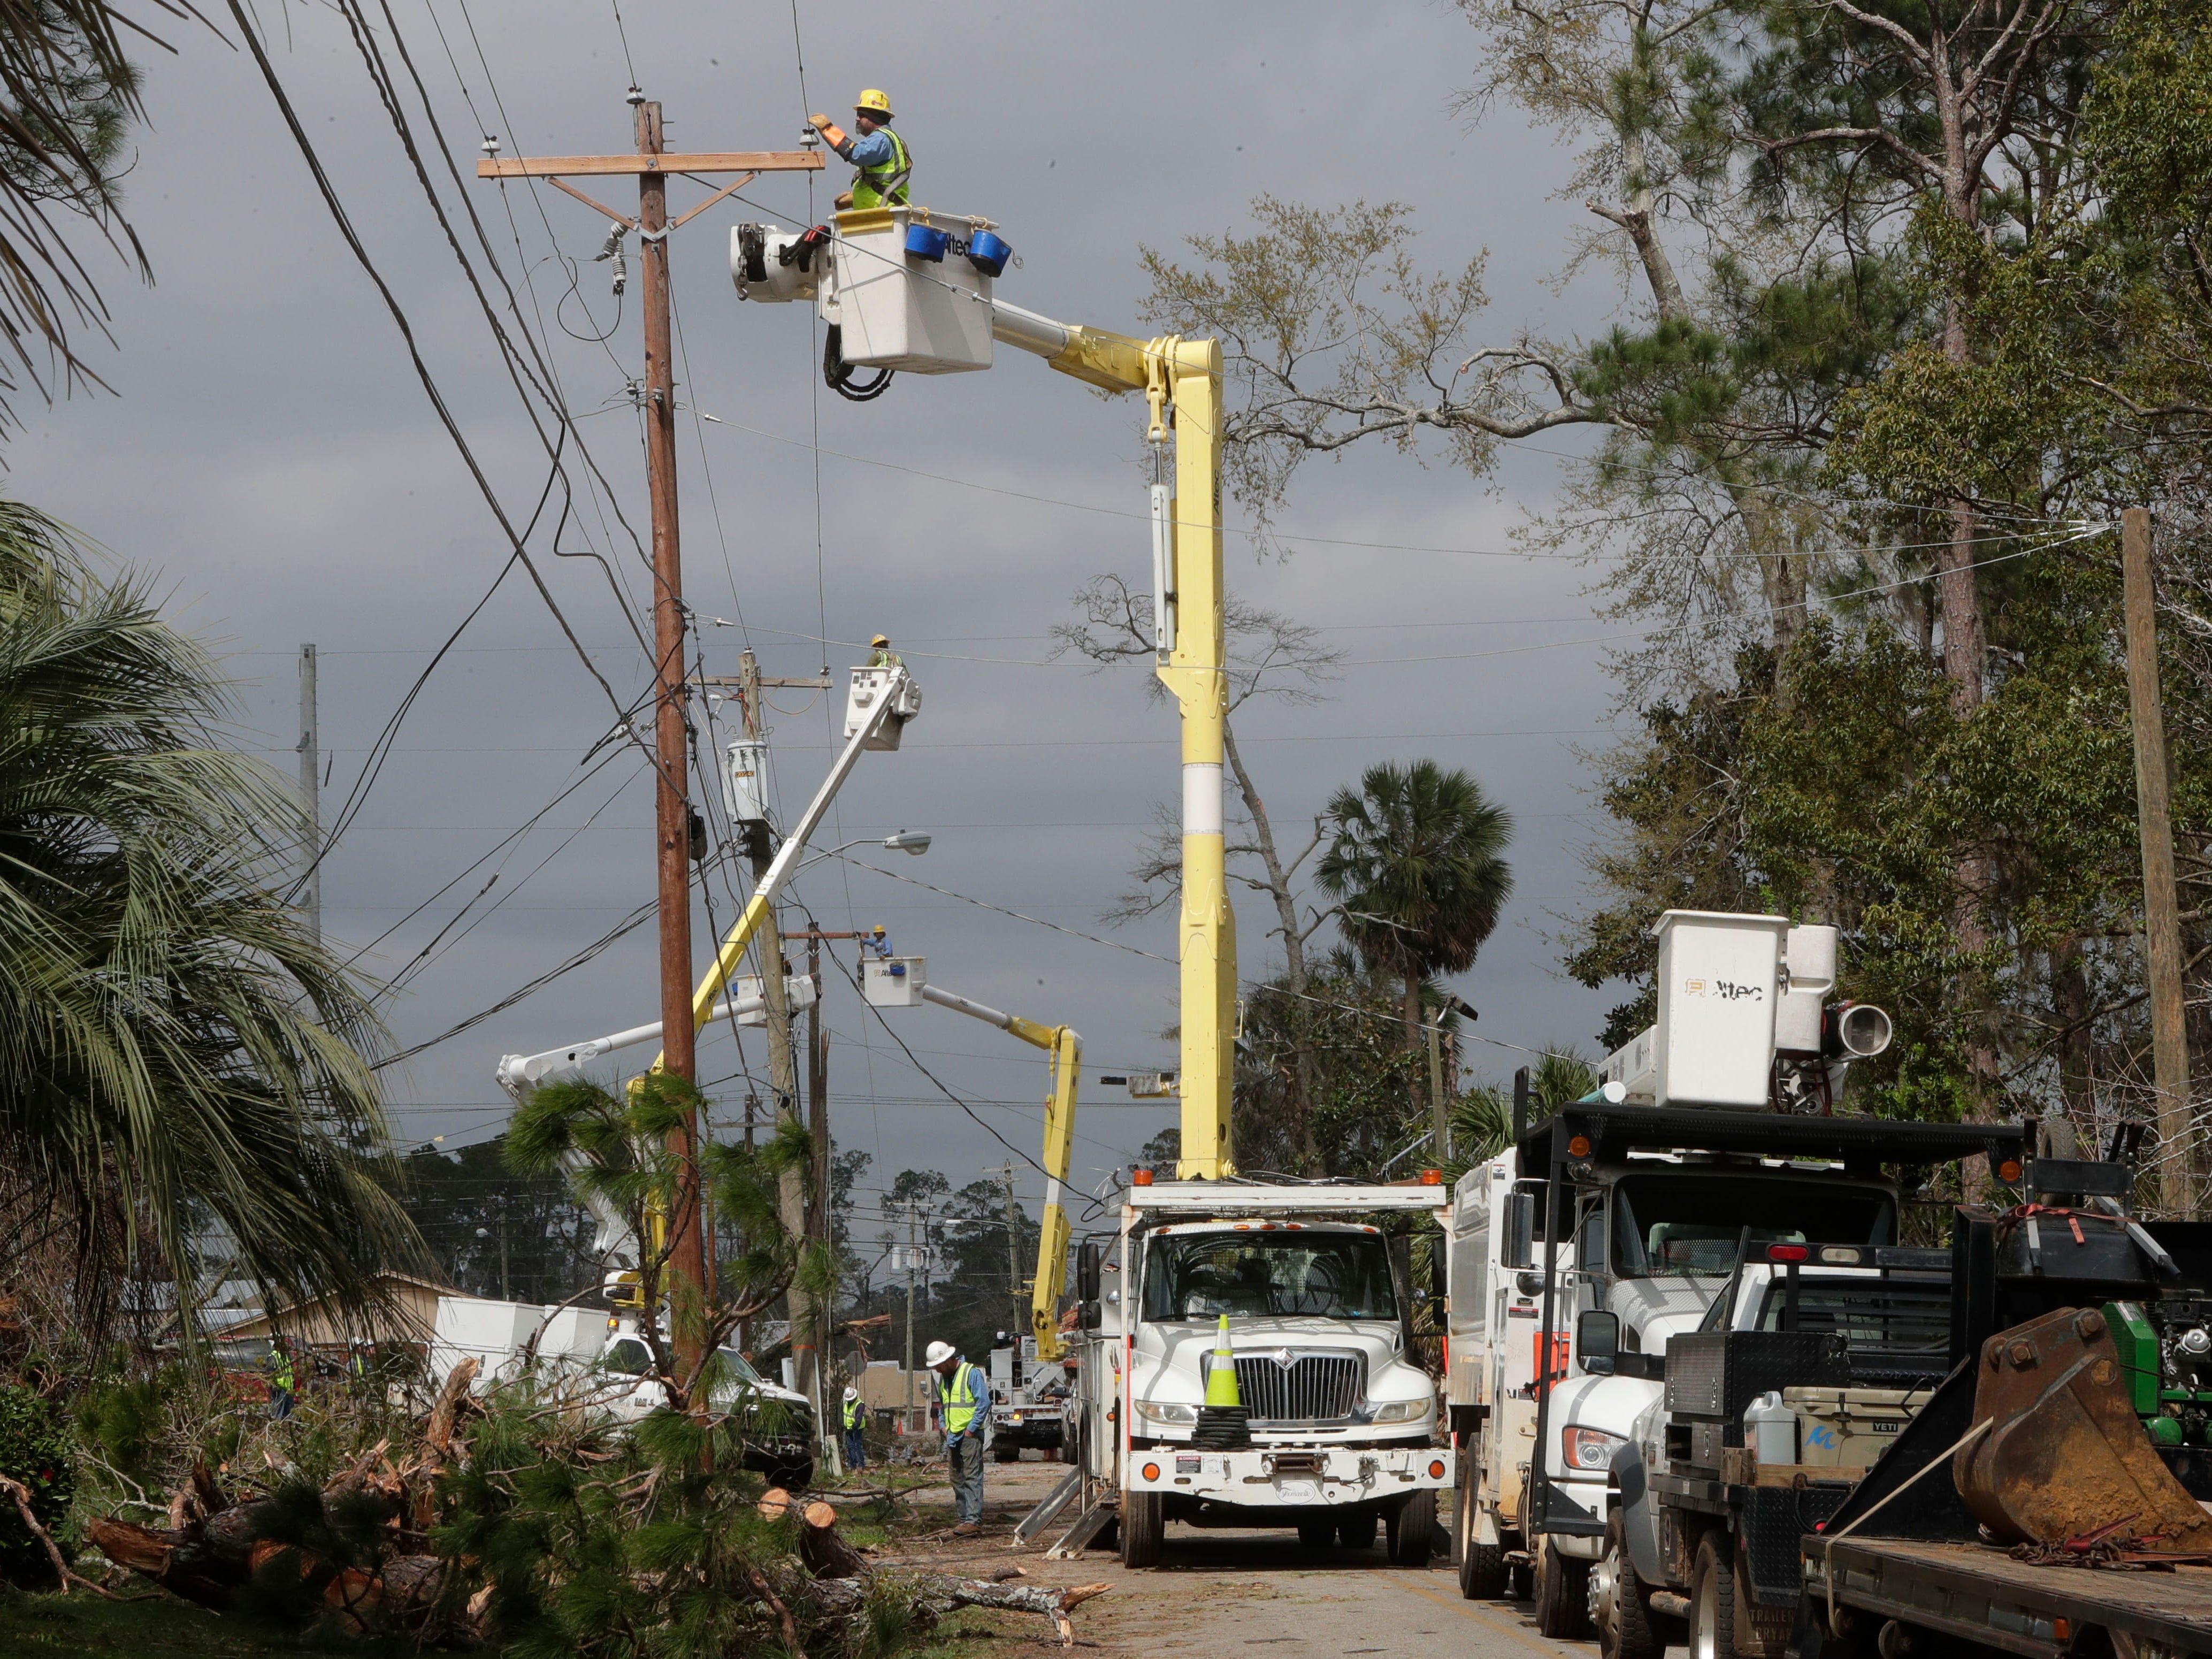 Crews work to restore power in Cairo, Ga. on March 4, 2019.